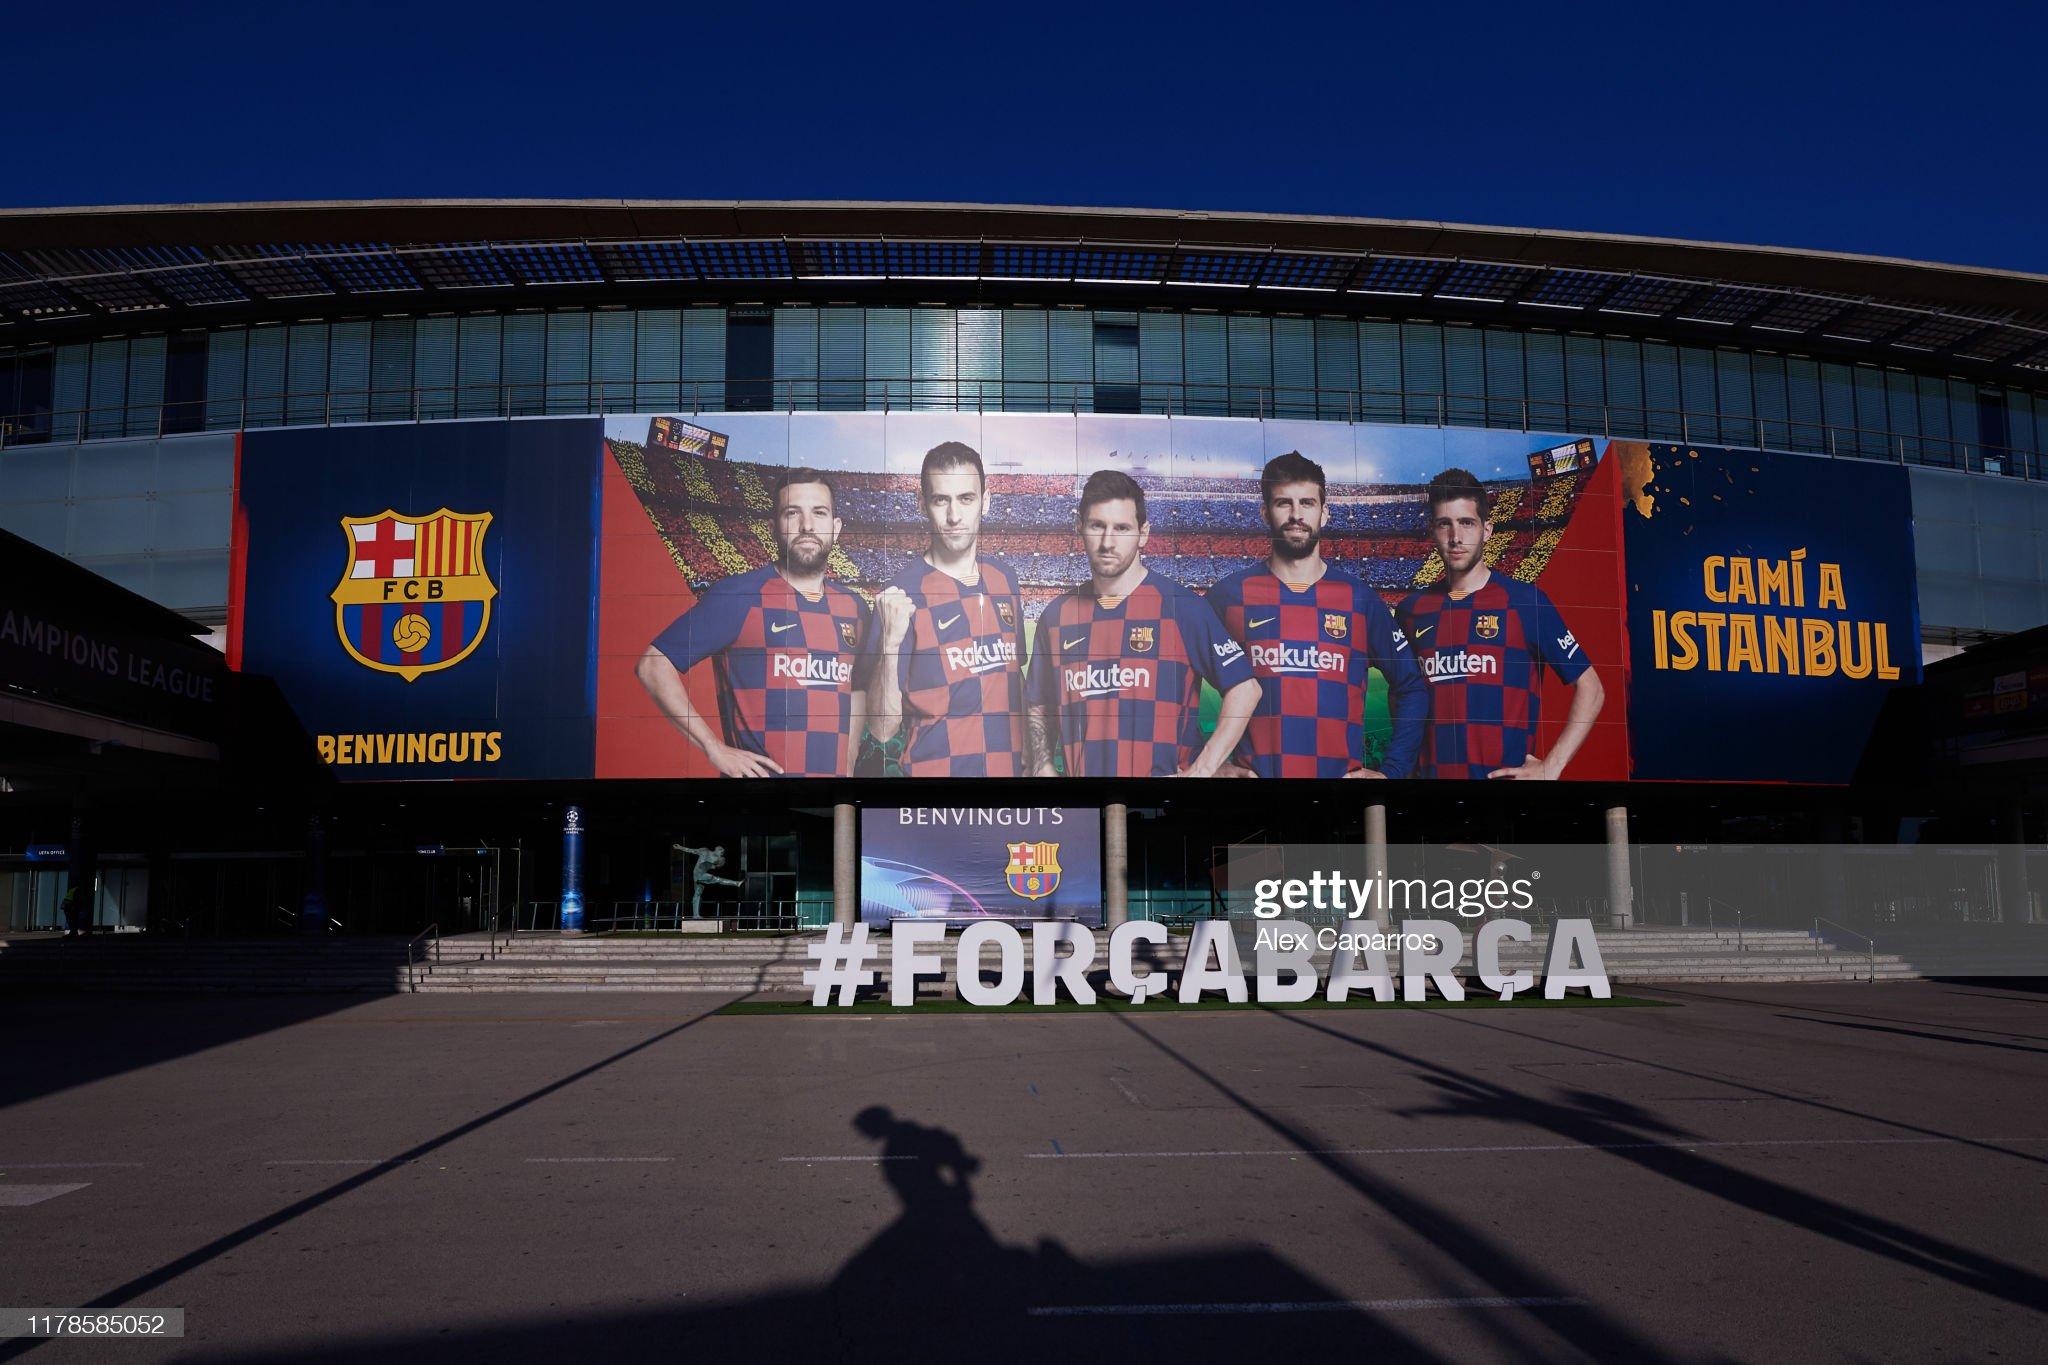 صور مباراة : برشلونة - إنتر 2-1 ( 02-10-2019 )  An-outside-view-of-the-camp-nou-stadium-ahead-of-the-uefa-champions-picture-id1178585052?s=2048x2048